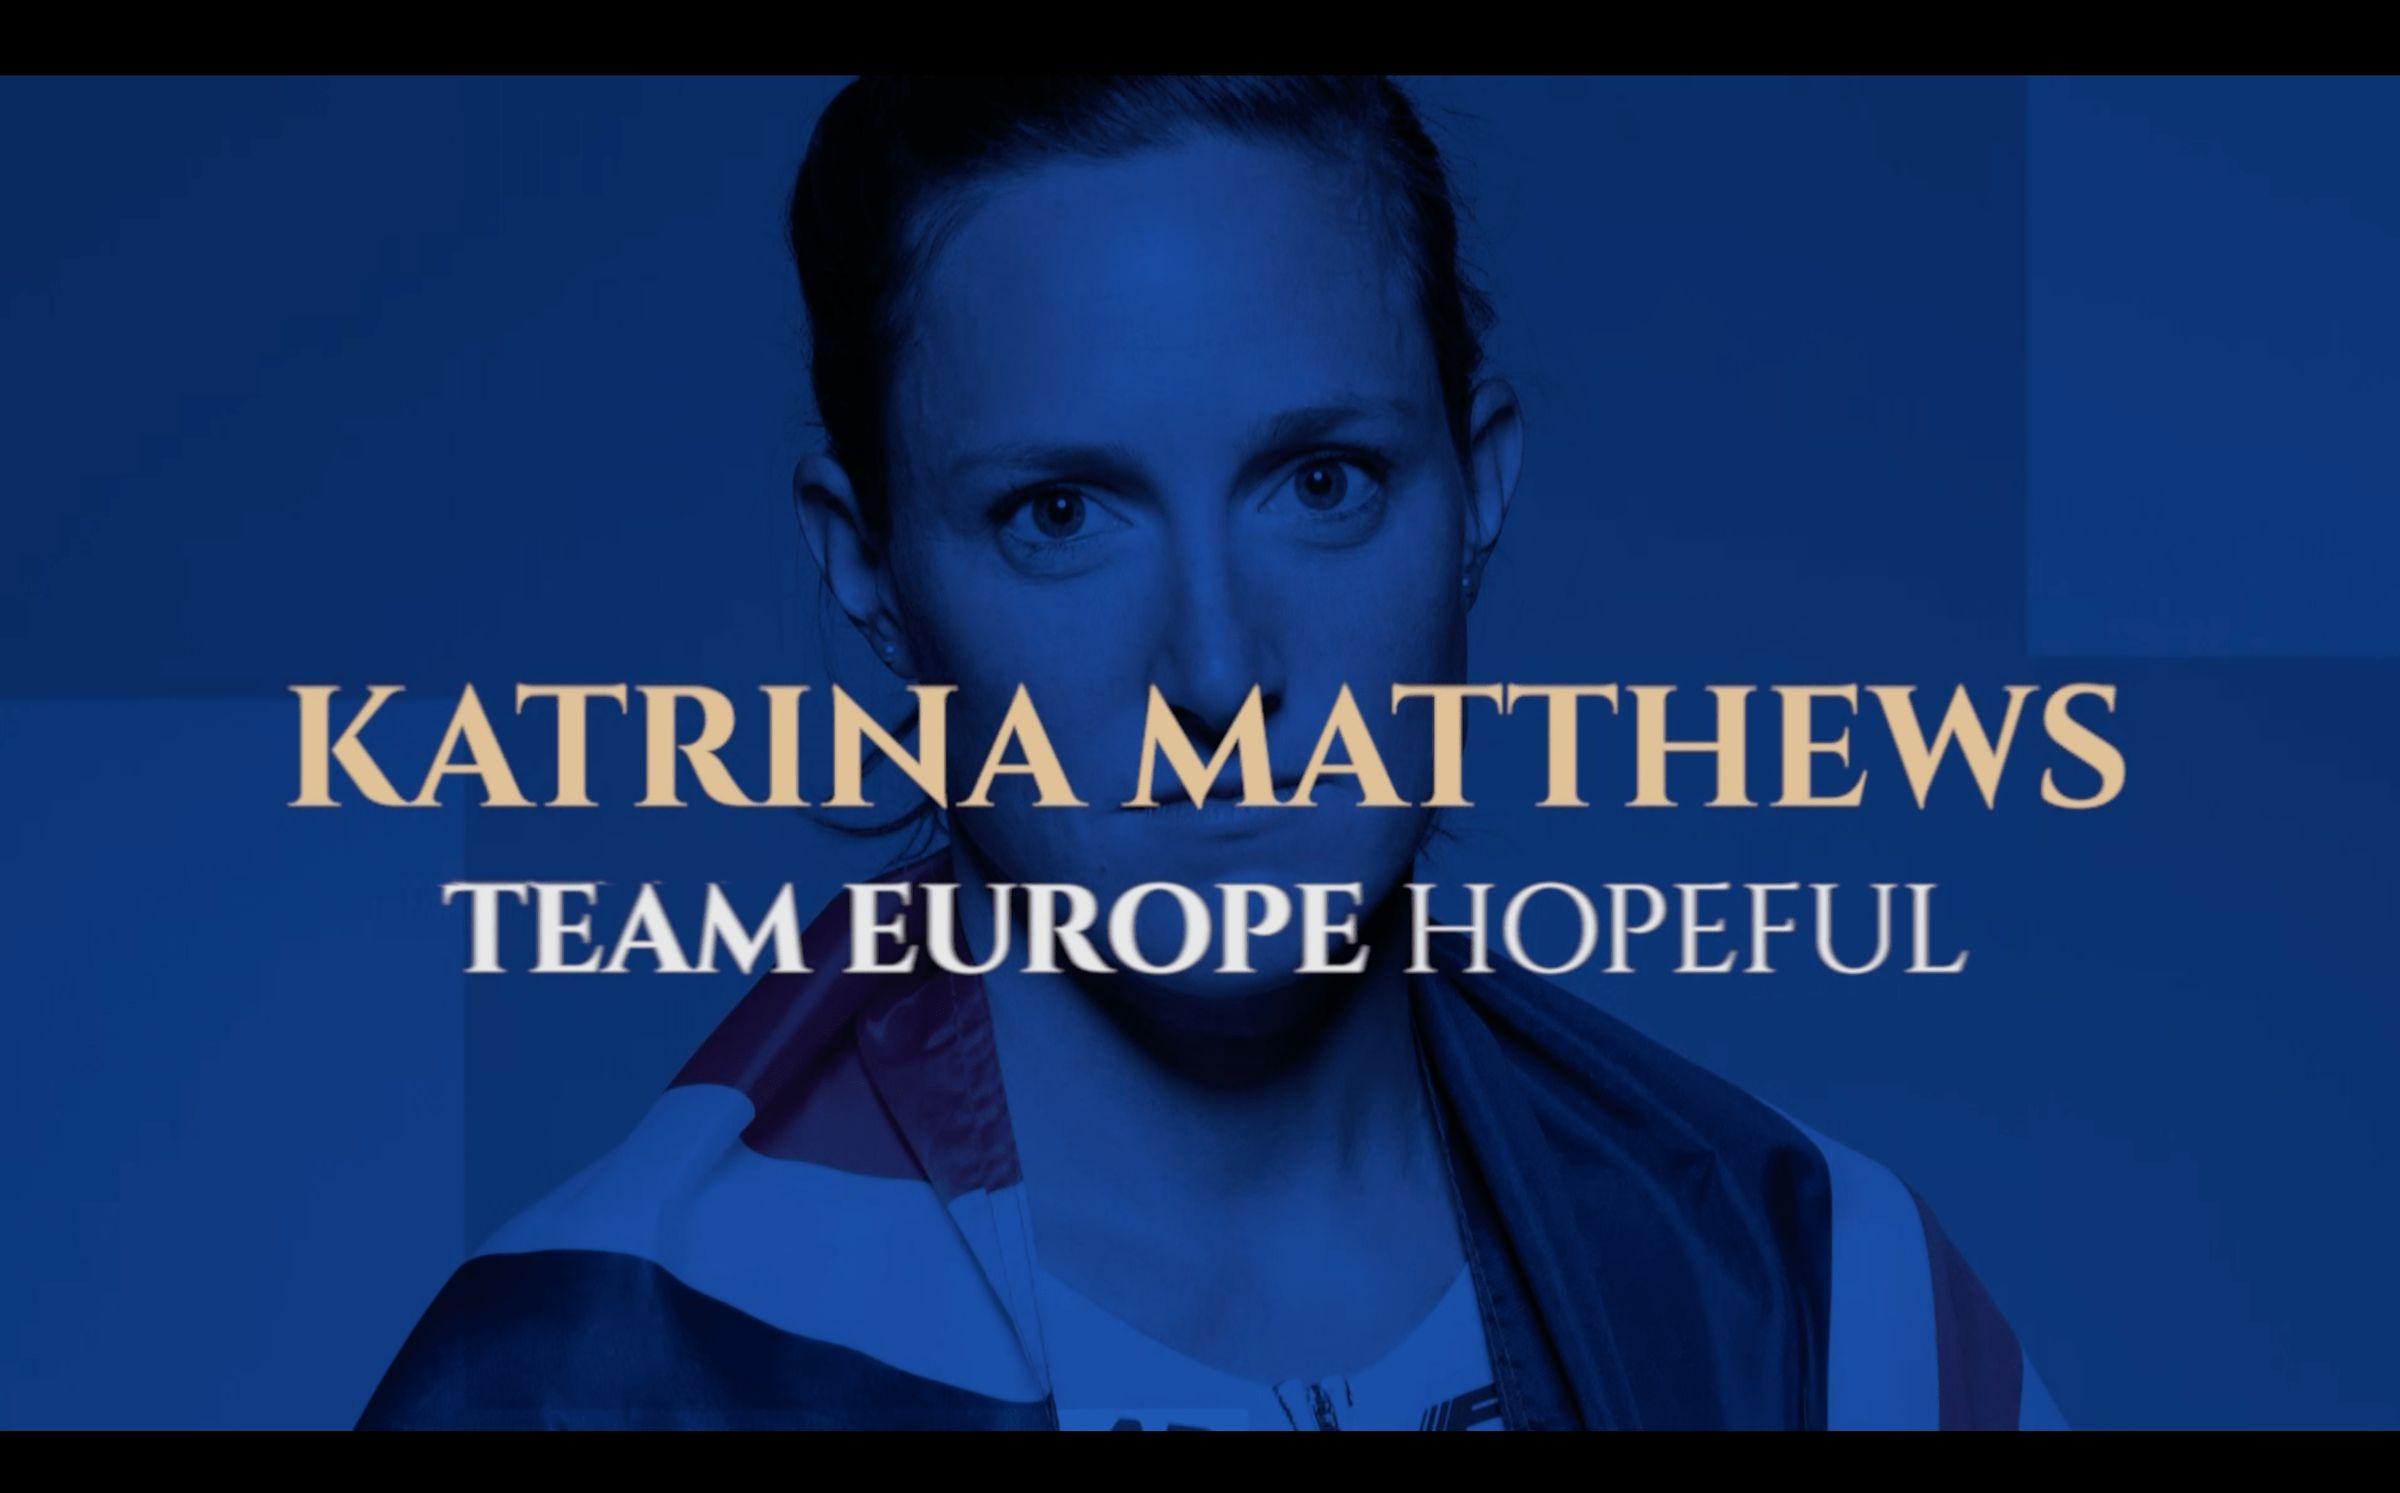 Katrina Matthews: Collins Cup Profile | Team Europe